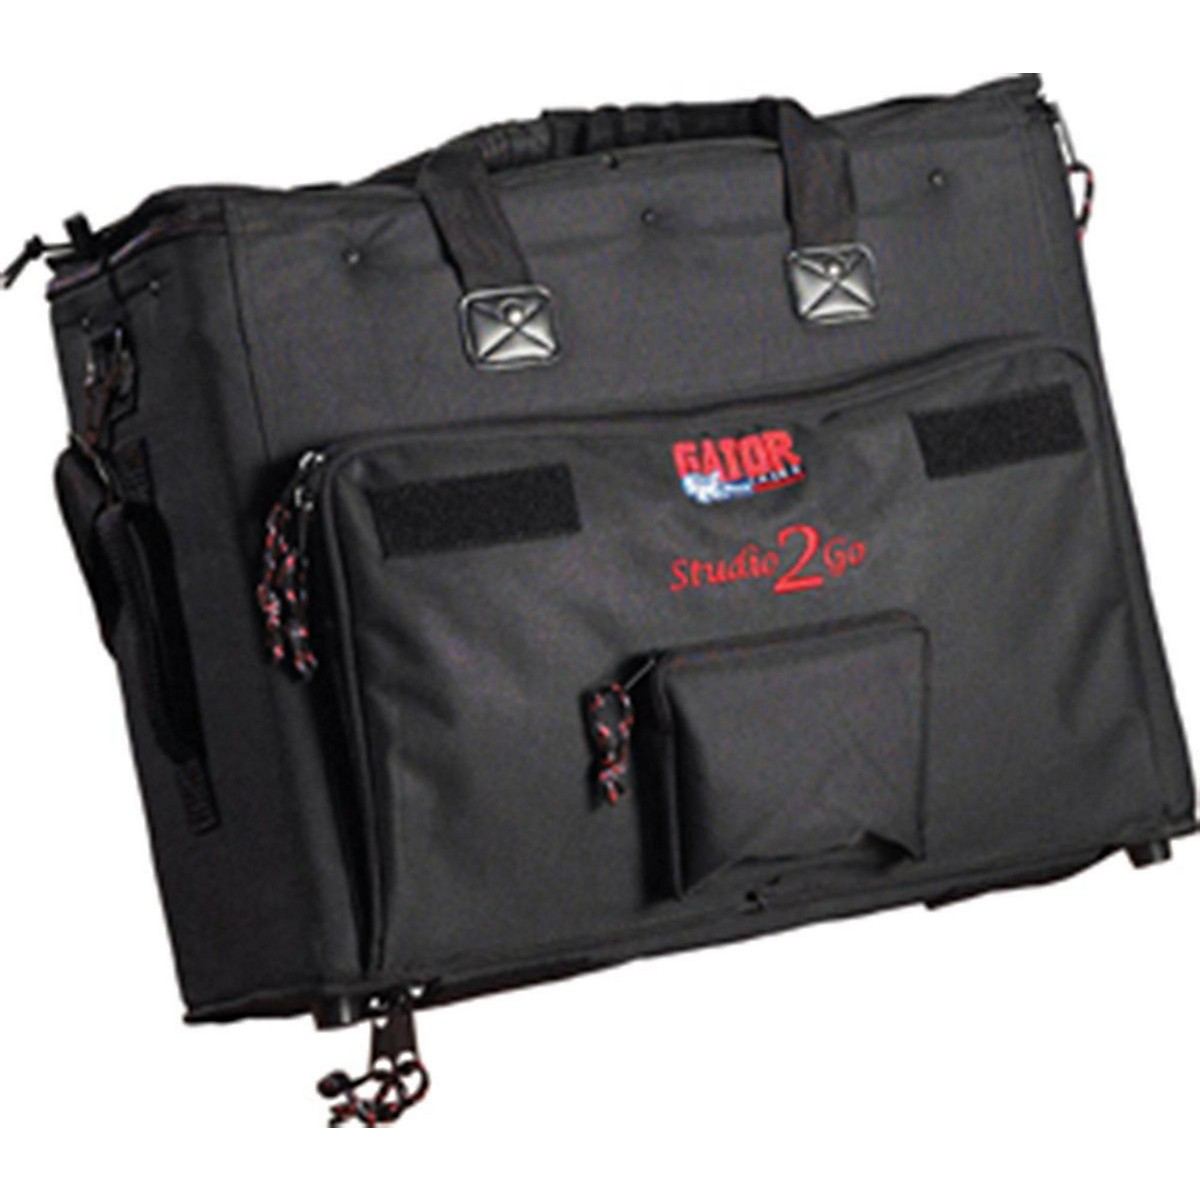 Gator GSR2U Rack and Laptop Bag